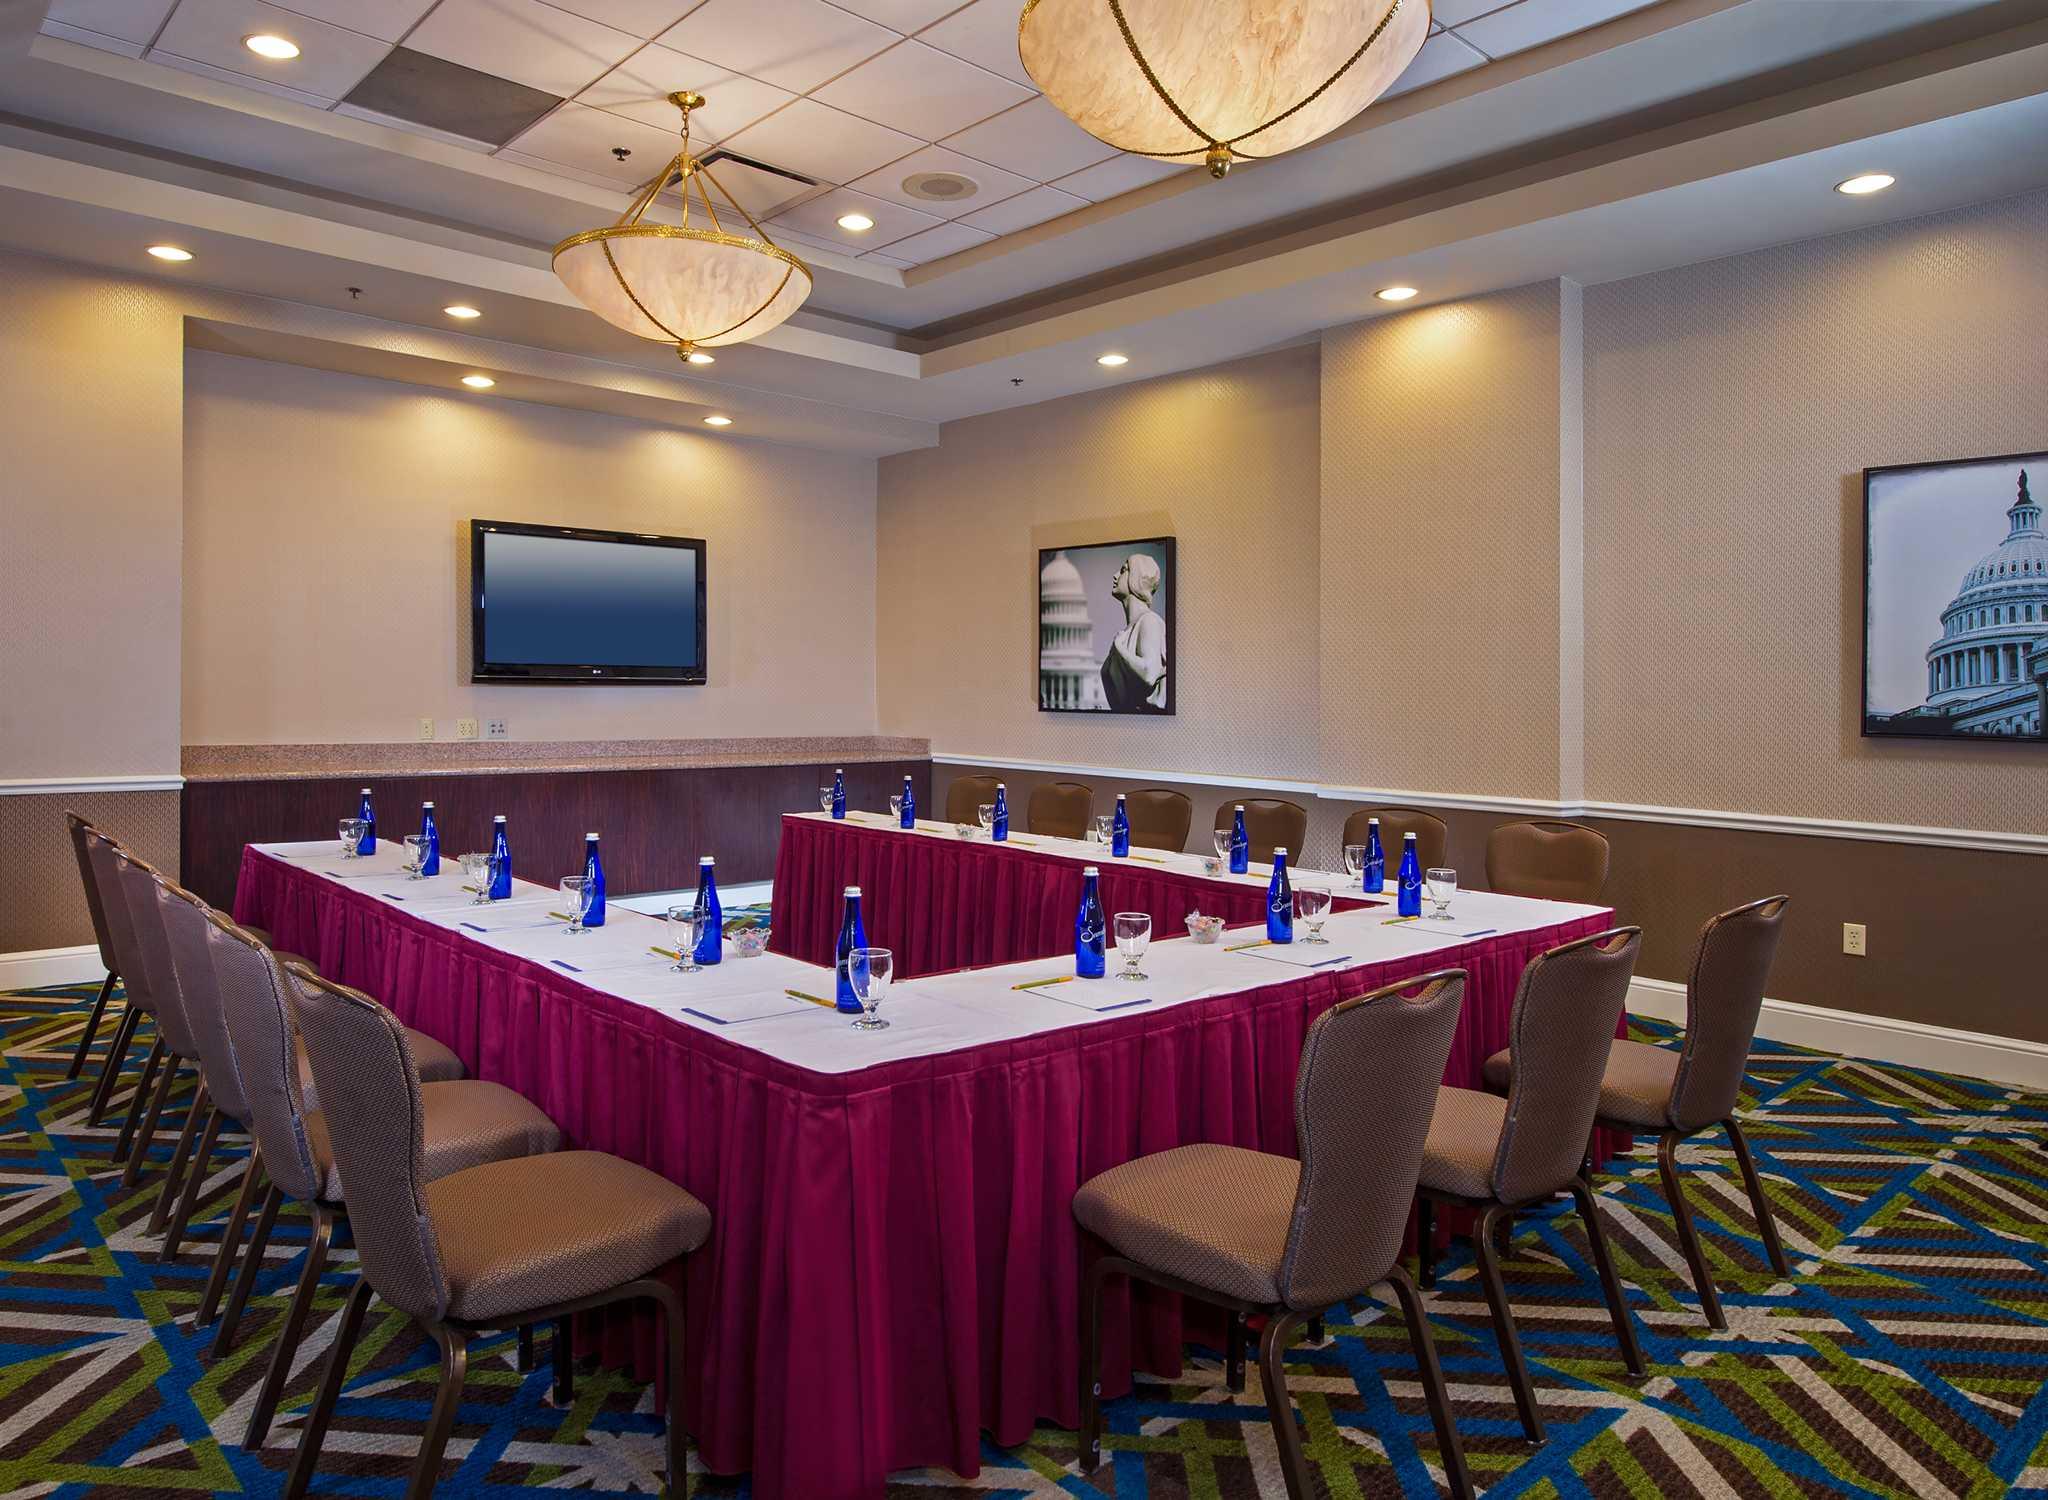 Hotell I Centrala Washington D C Hilton Garden Inn Washington D C